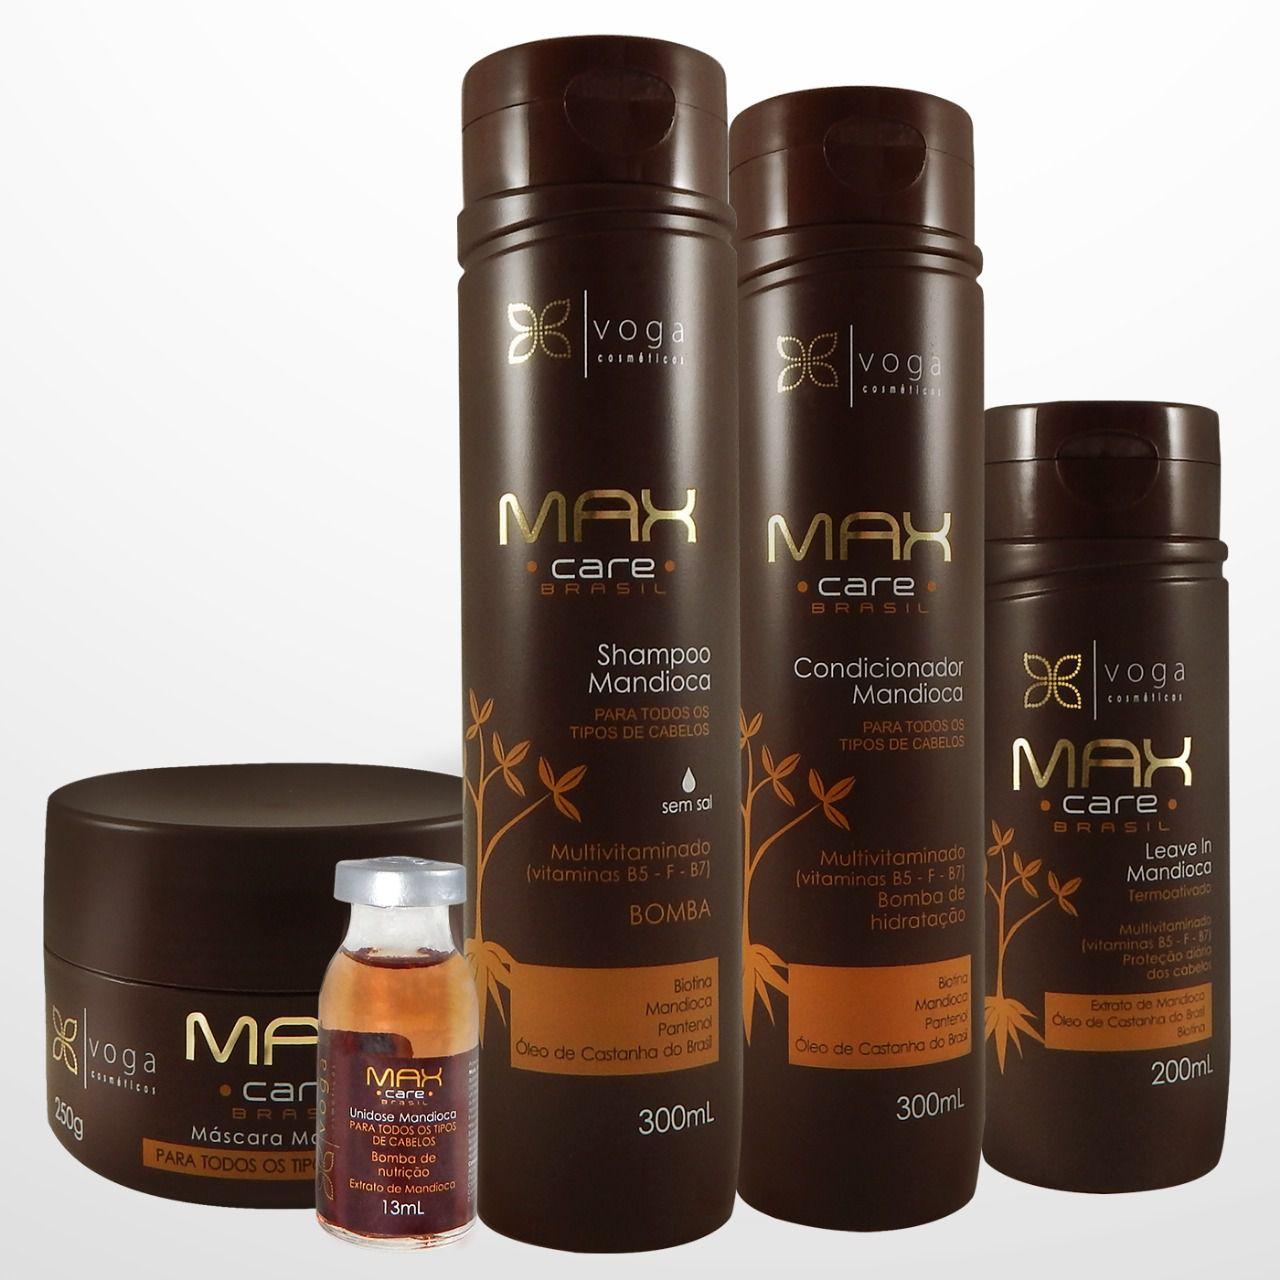 Kit Completo Bomba de Crescimento Max Care Brasil Voga Cosméticos (5 produtos)